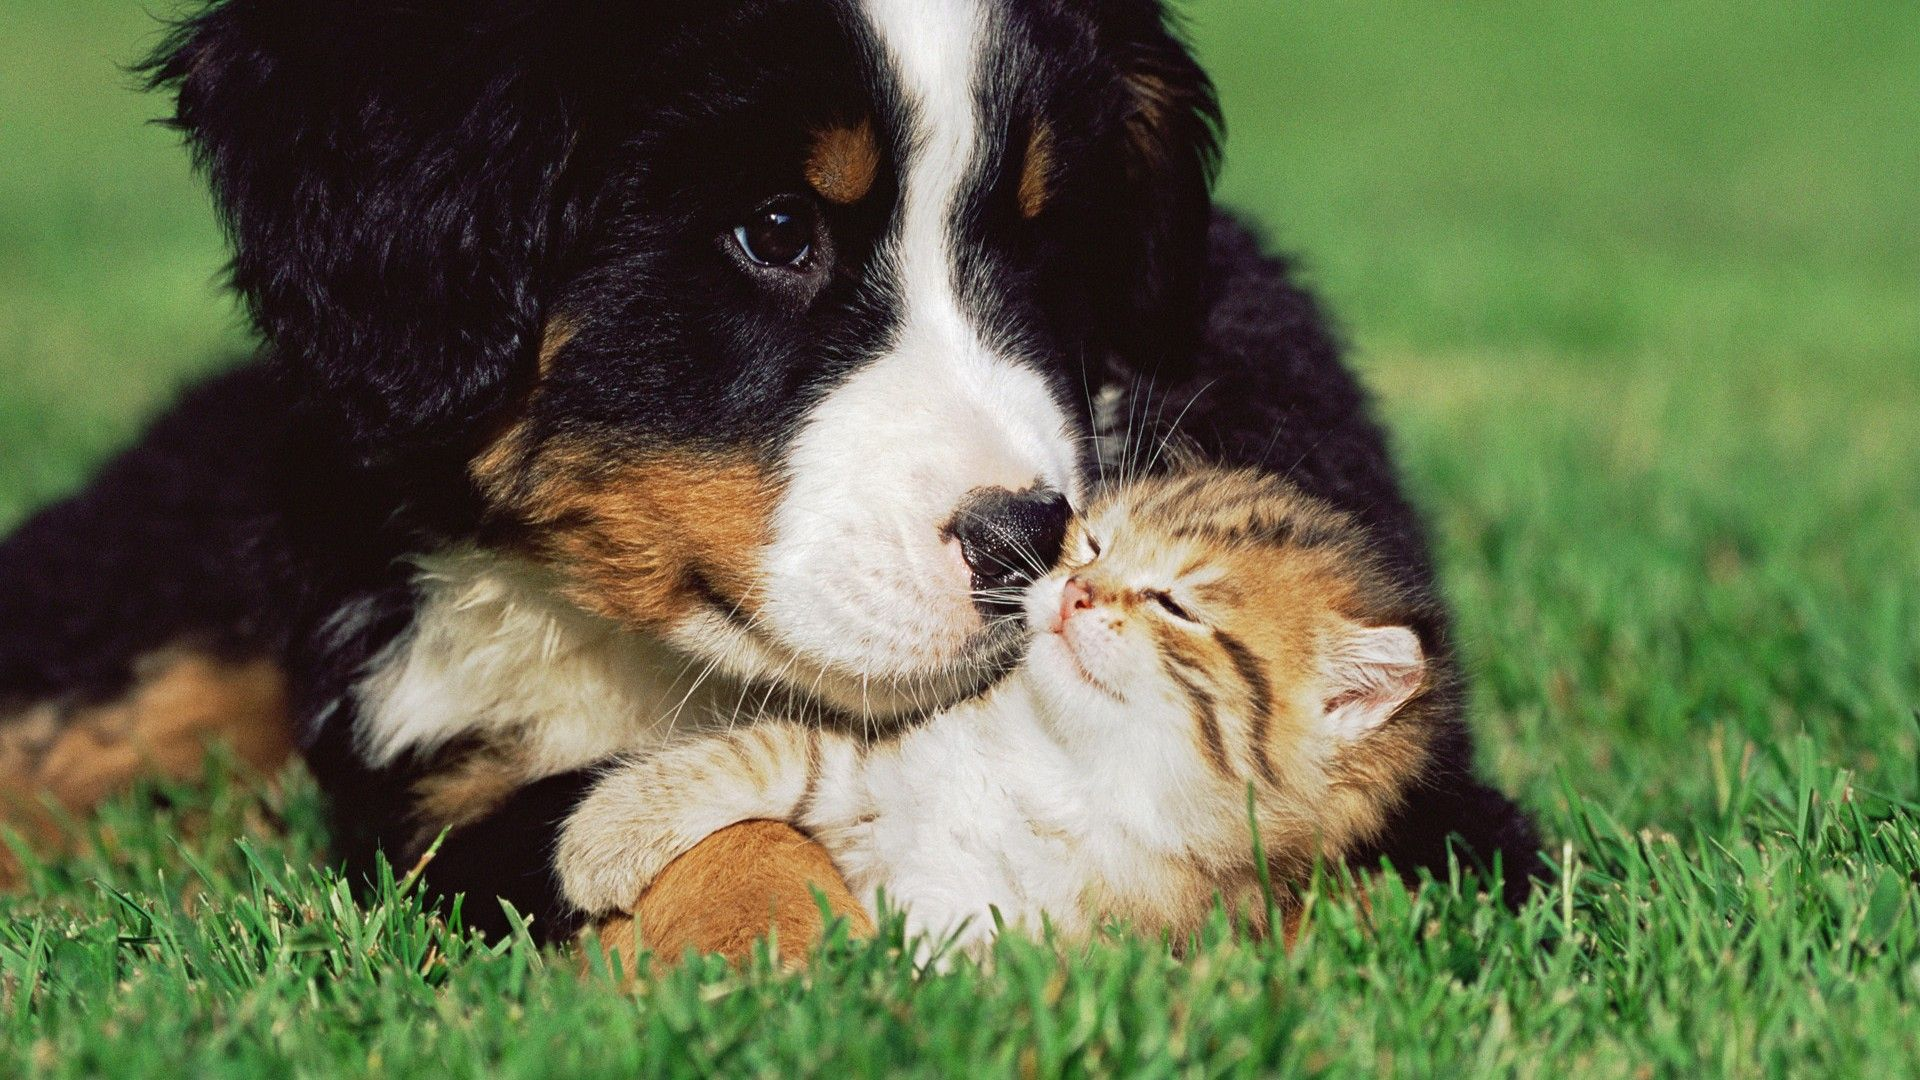 Puppy And Kitten wallpaper photo hd